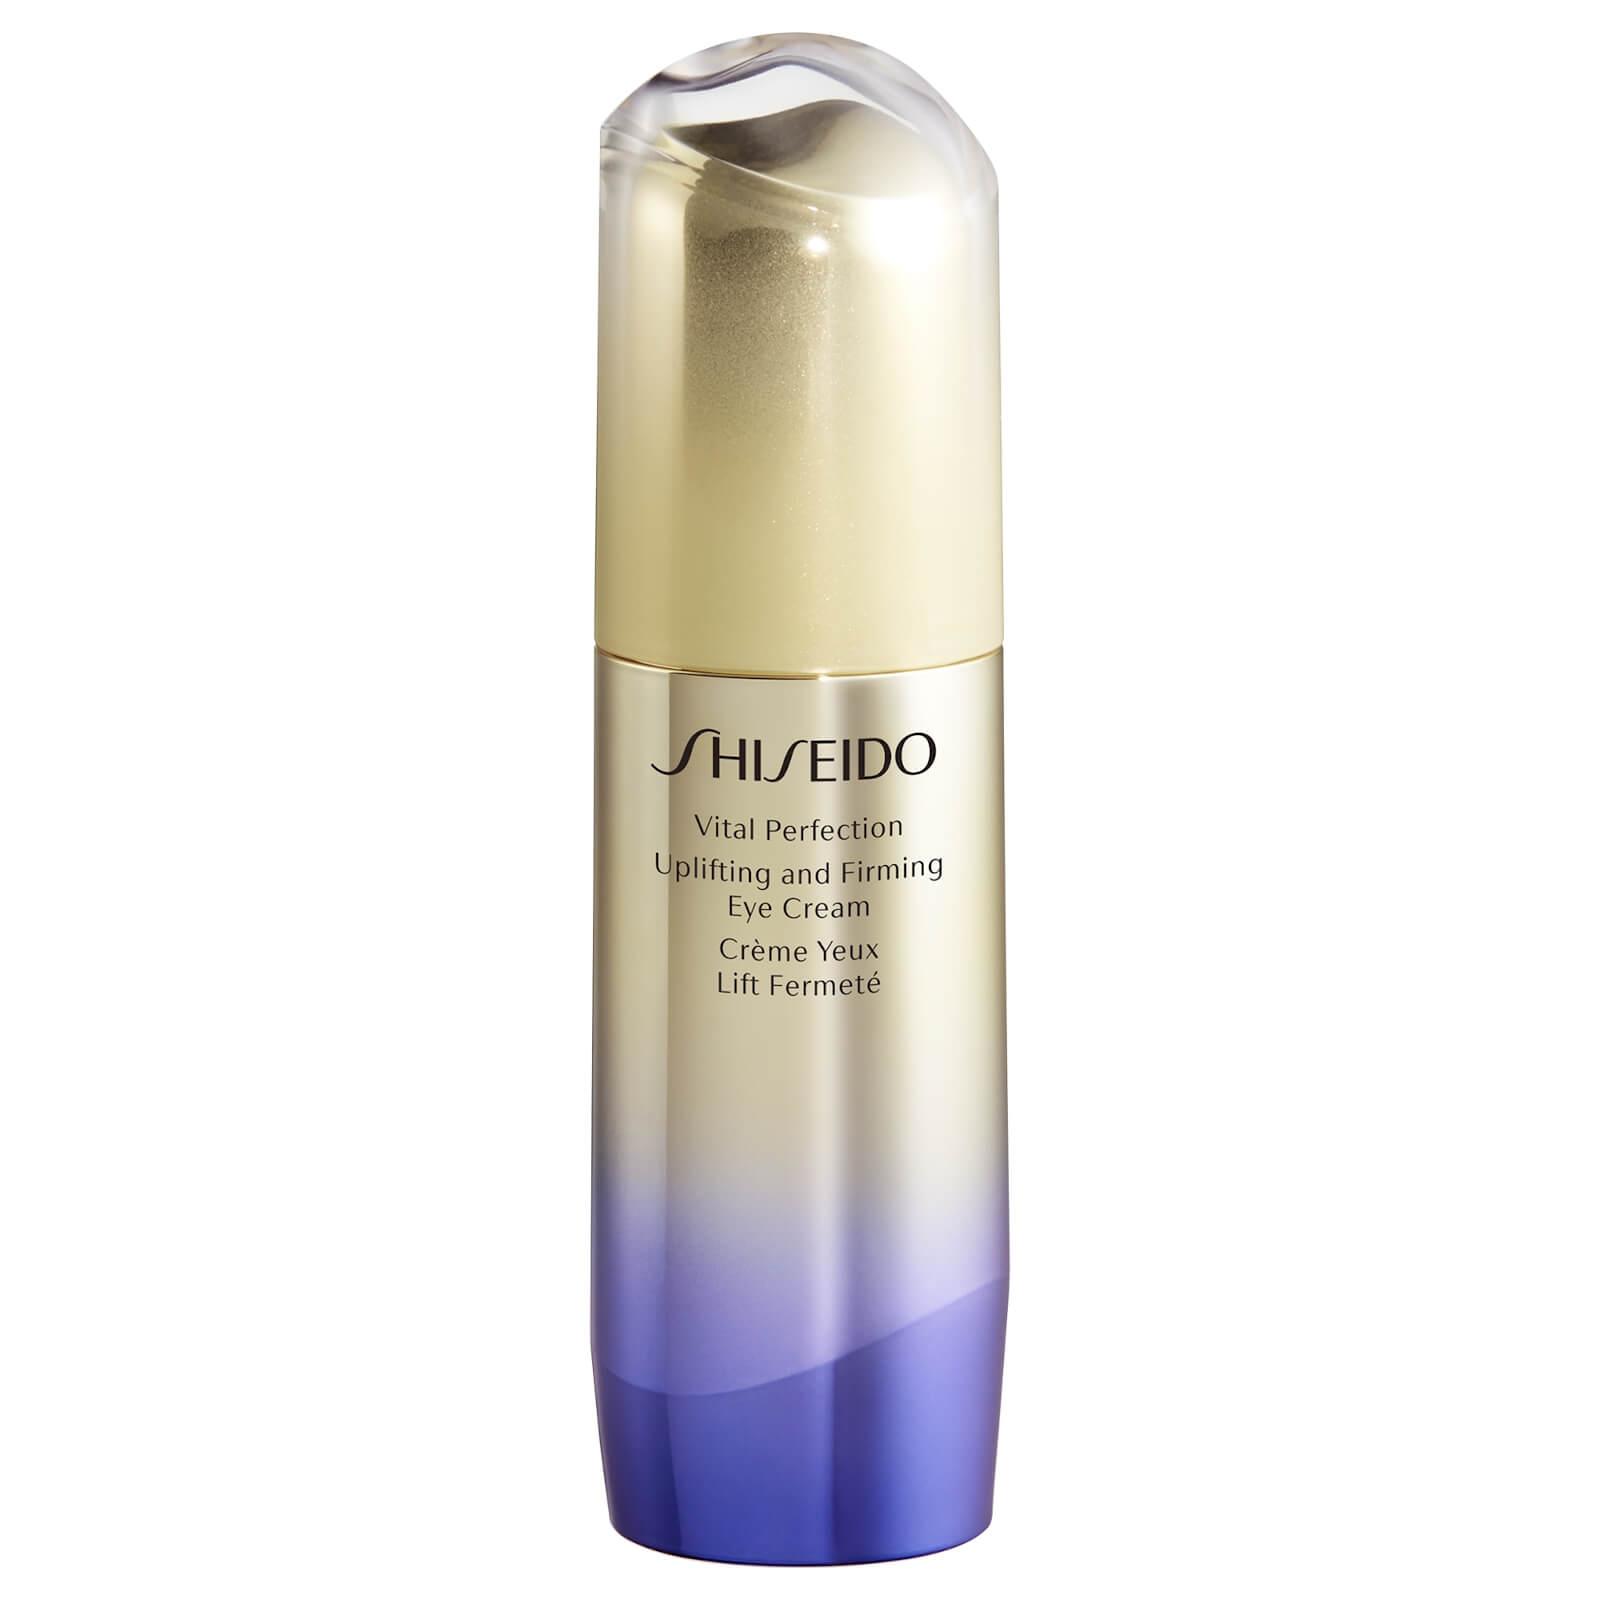 Купить Shiseido Vital Perfection Uplifting and Firming Eye Cream 15ml